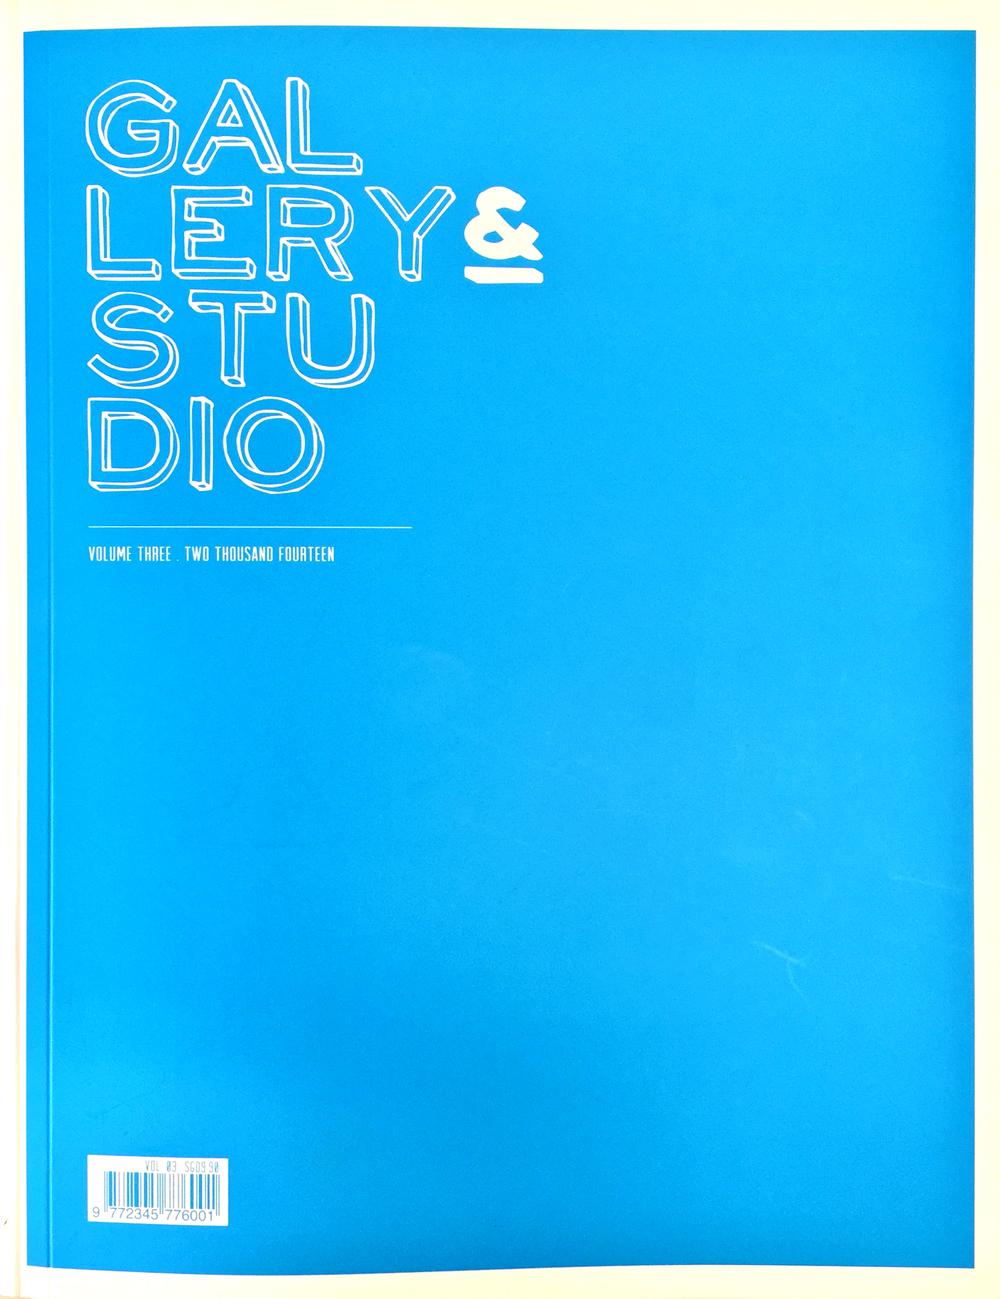 Gallery Studio - Cover_edited.jpg